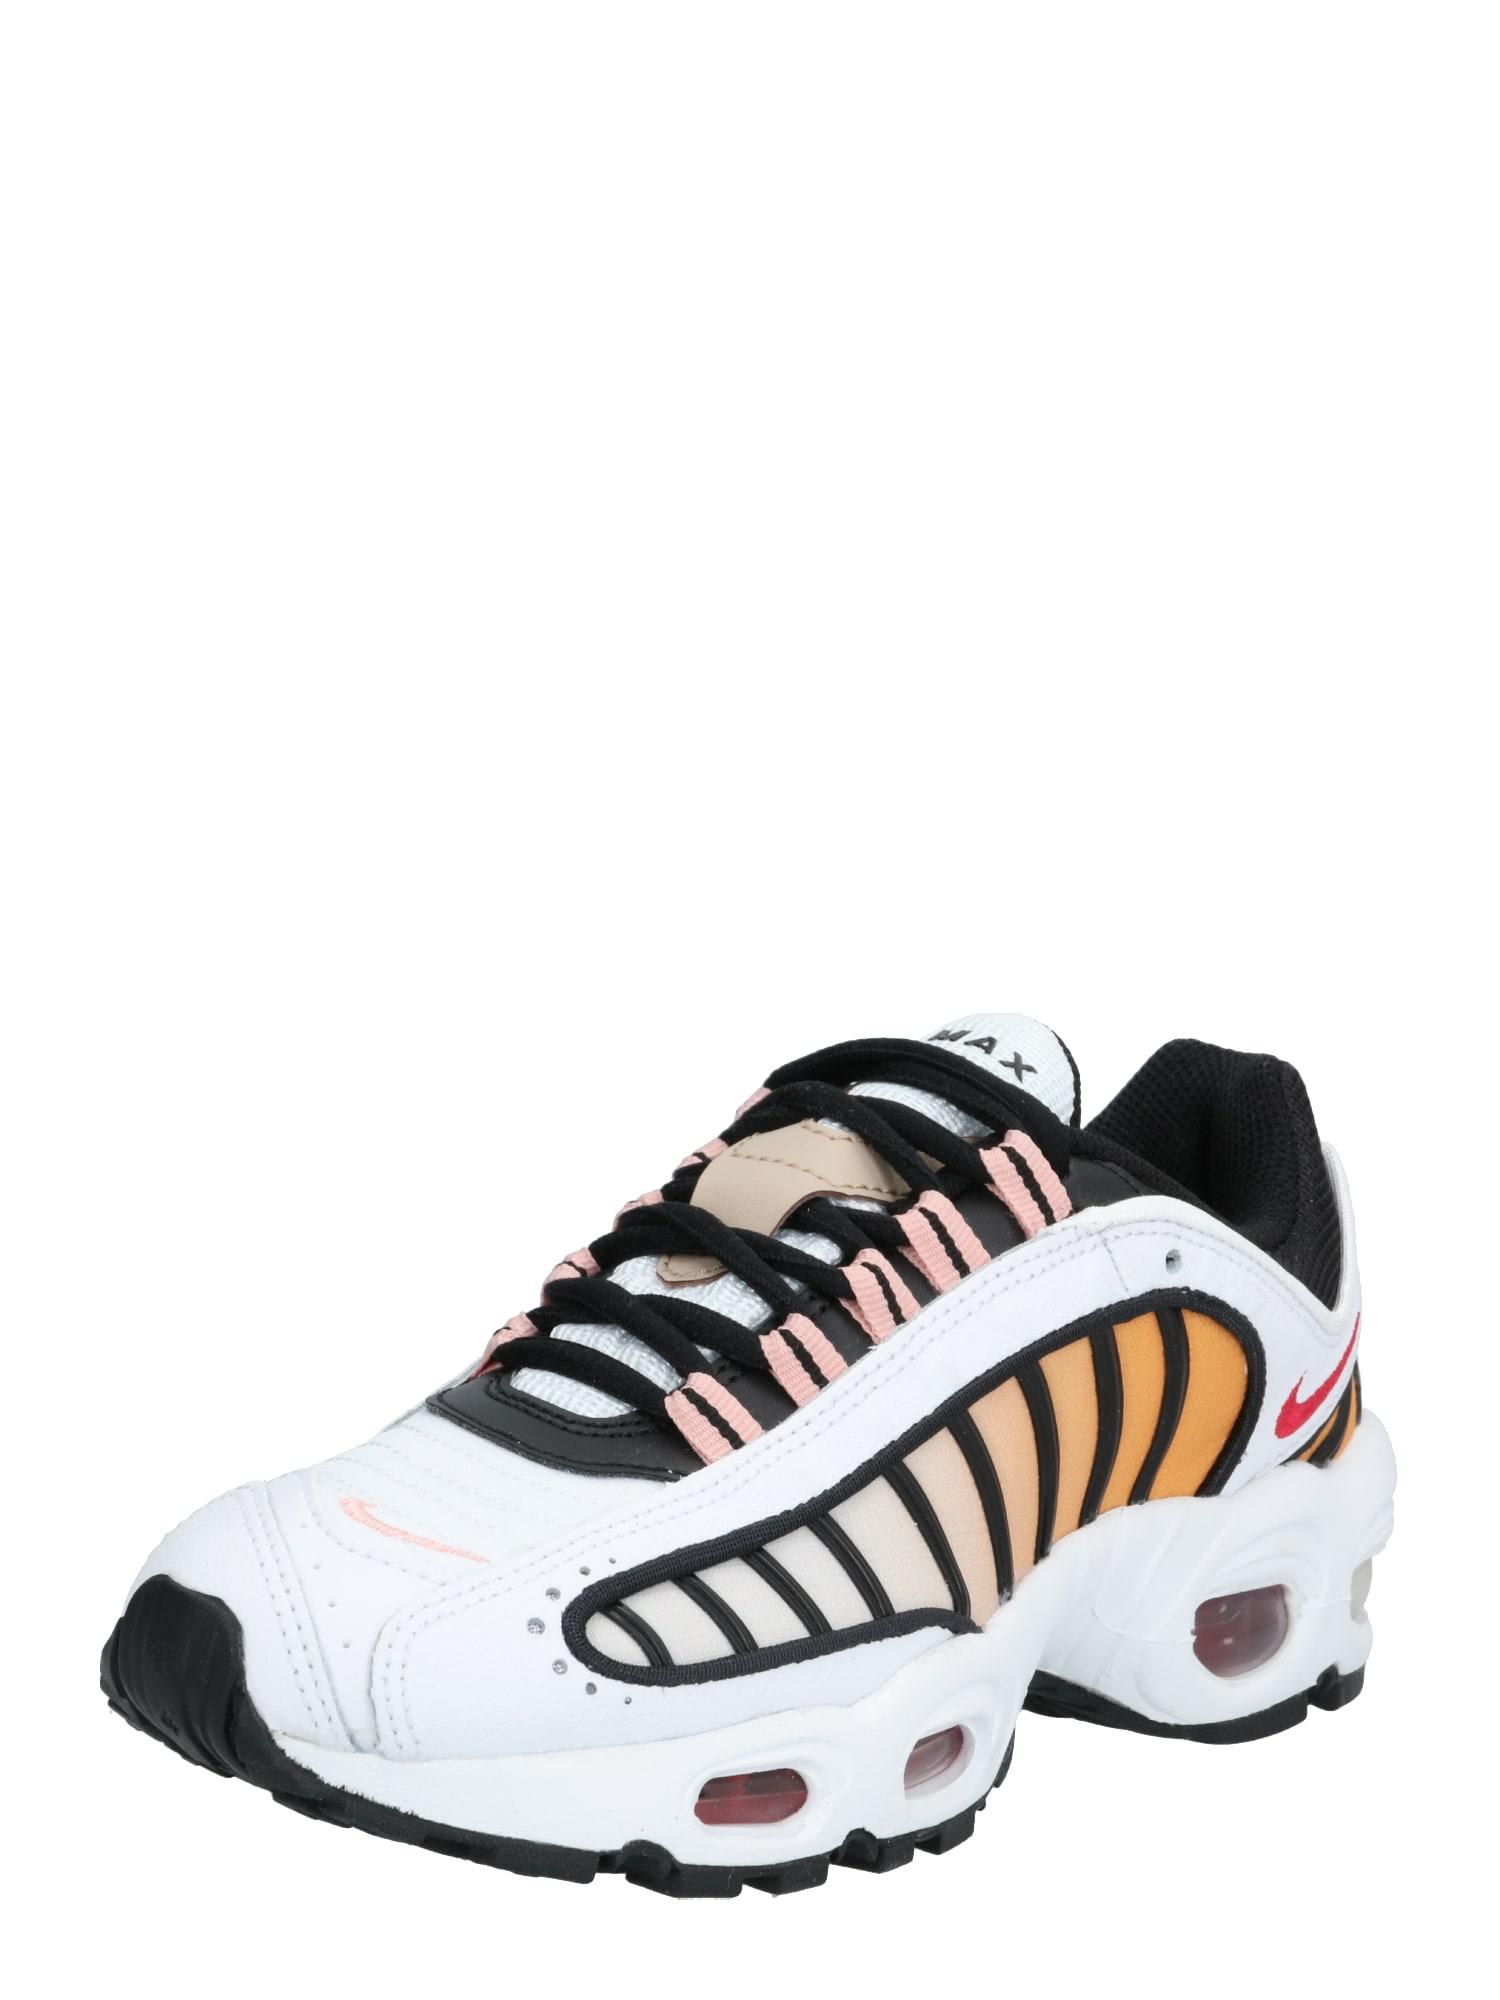 Nike Sportswear Nízke tenisky 'Nike Air Max Tailwind IV'  červené / čierna / biela